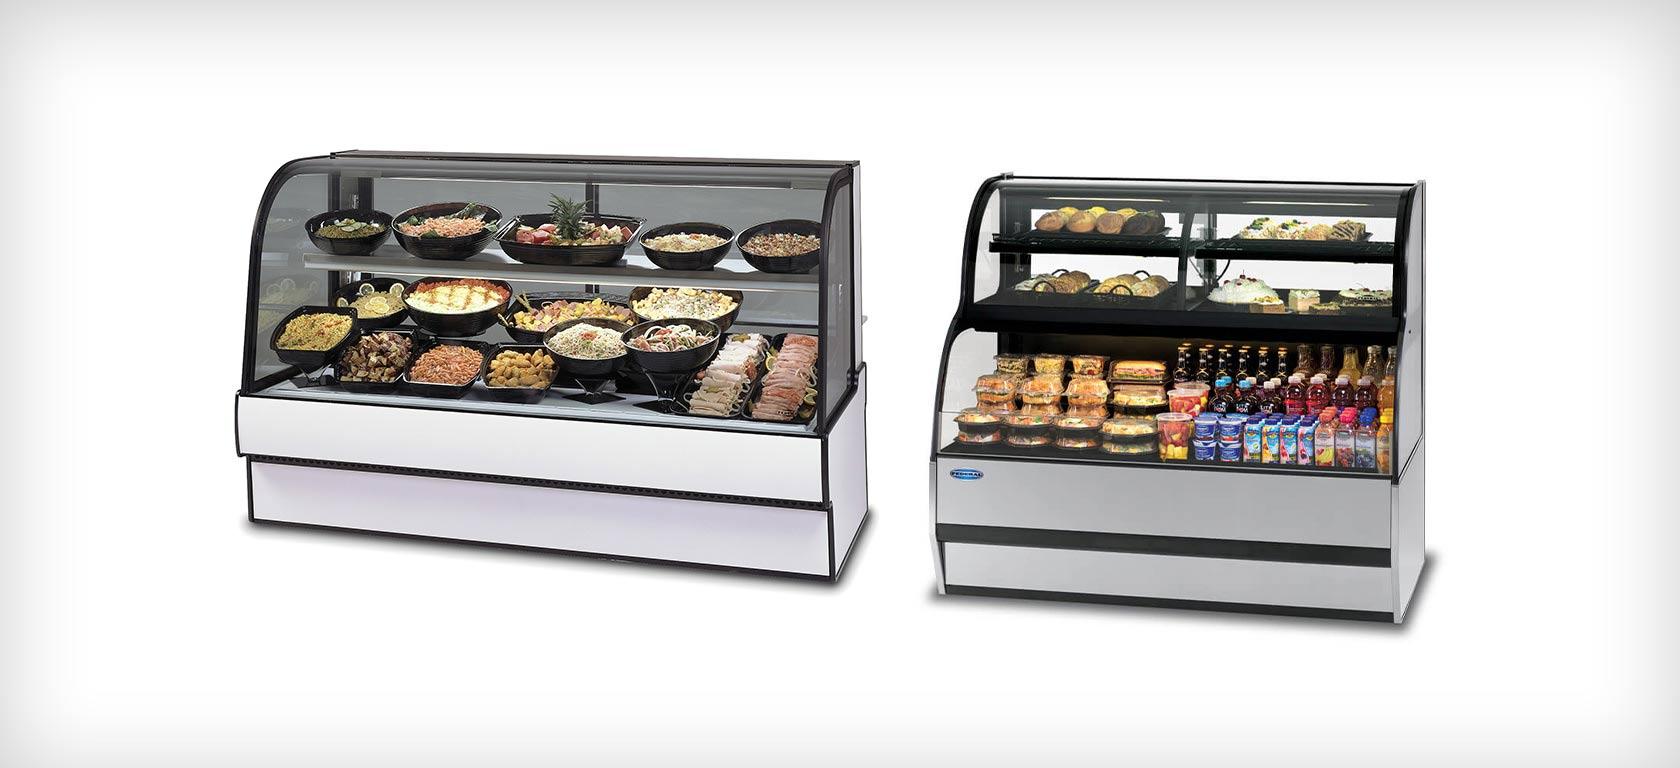 Refrigerated self-serve merchandisers